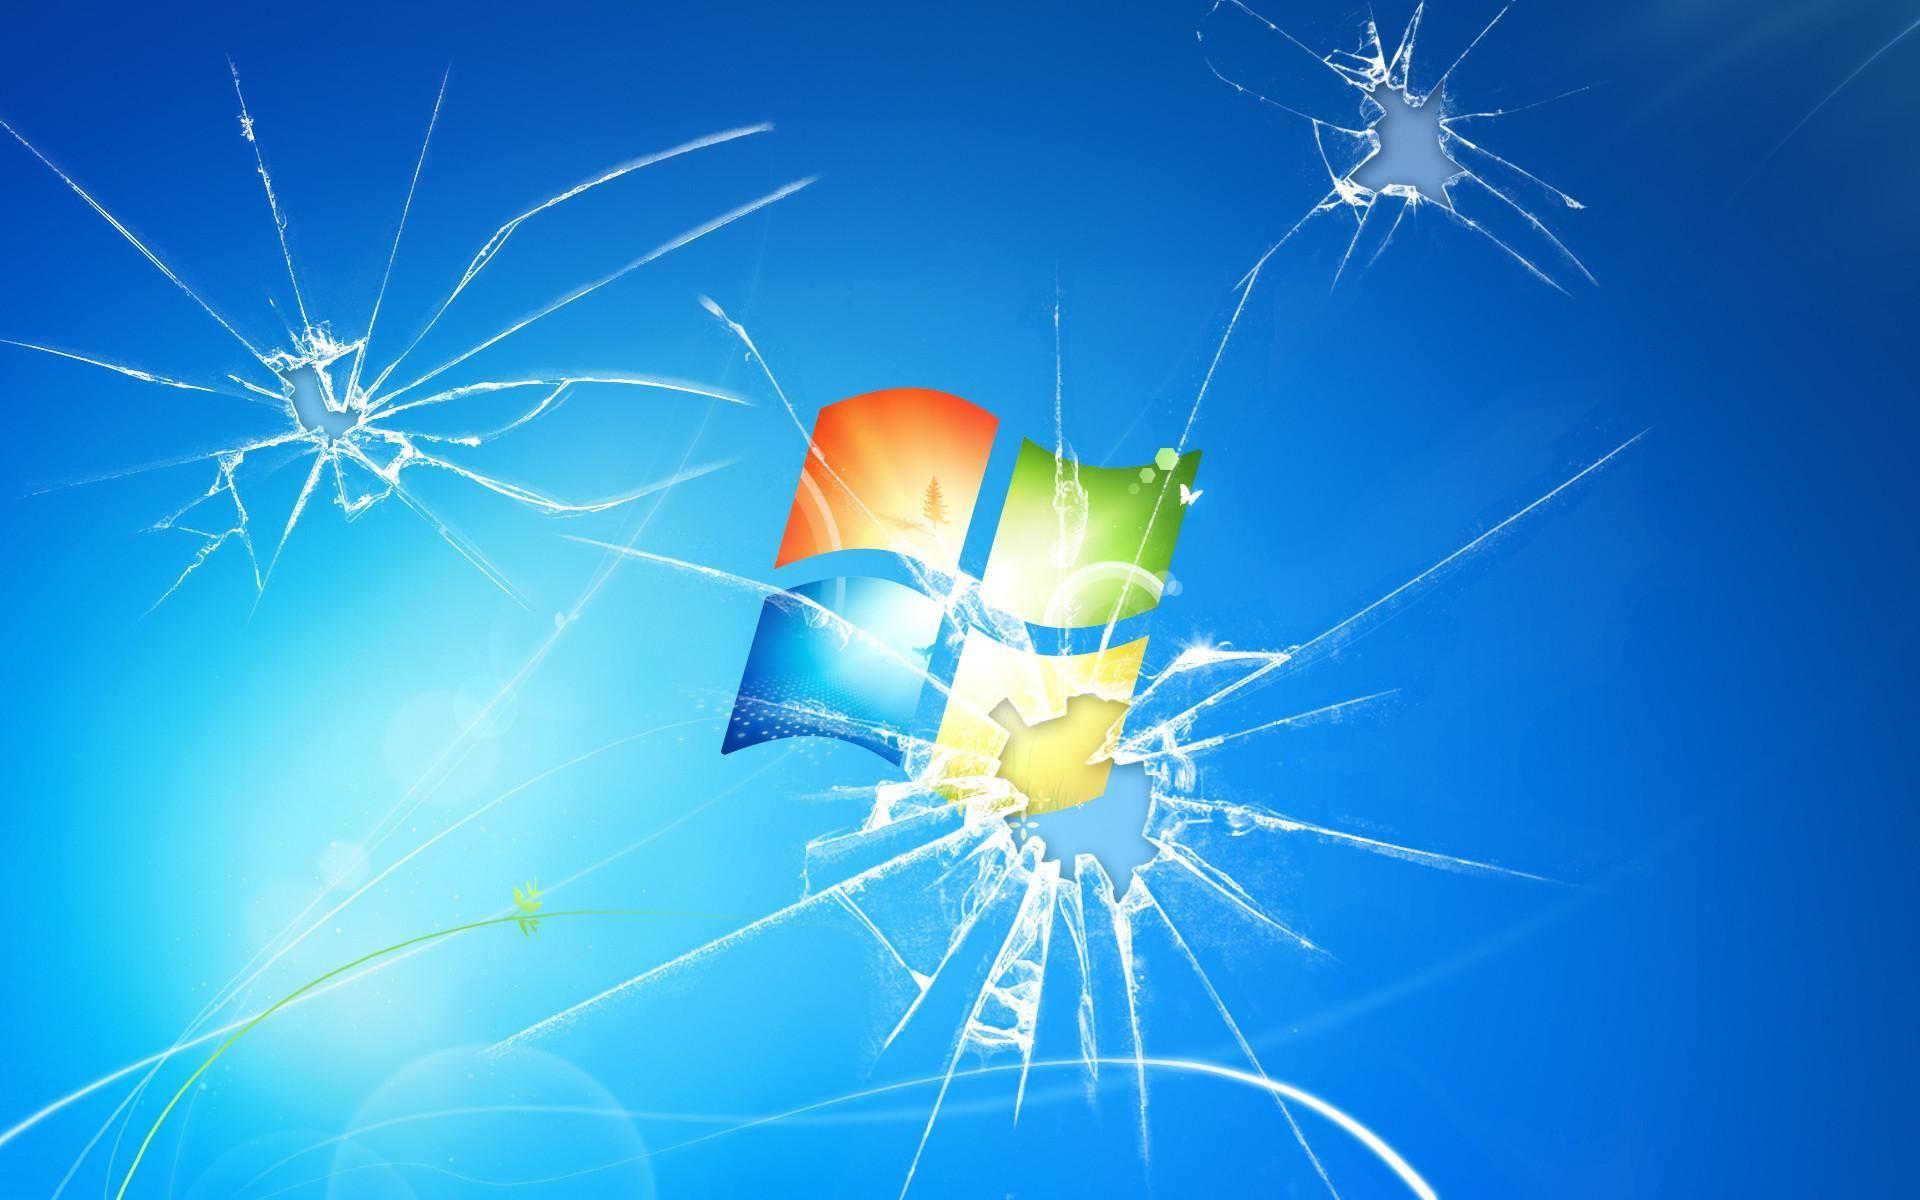 Windows 10 Wallpaper Broken Mywallpapers Site Broken Screen Wallpaper Hd Wallpapers For Pc Computer Screen Wallpaper